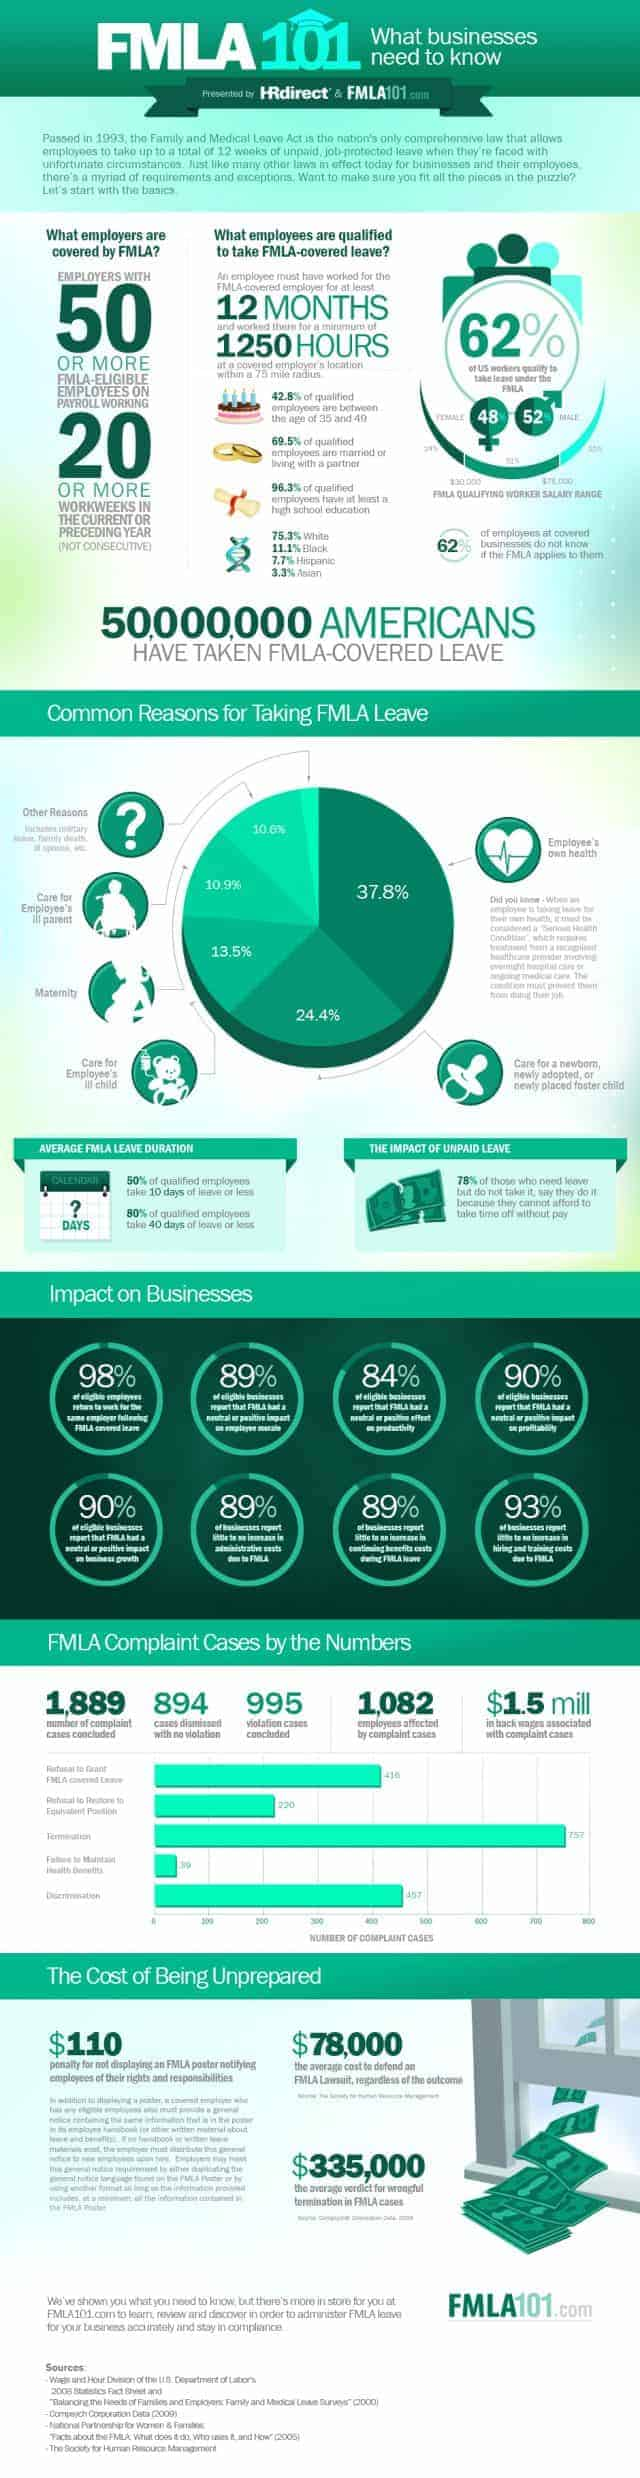 fmla-infographic-fmla101